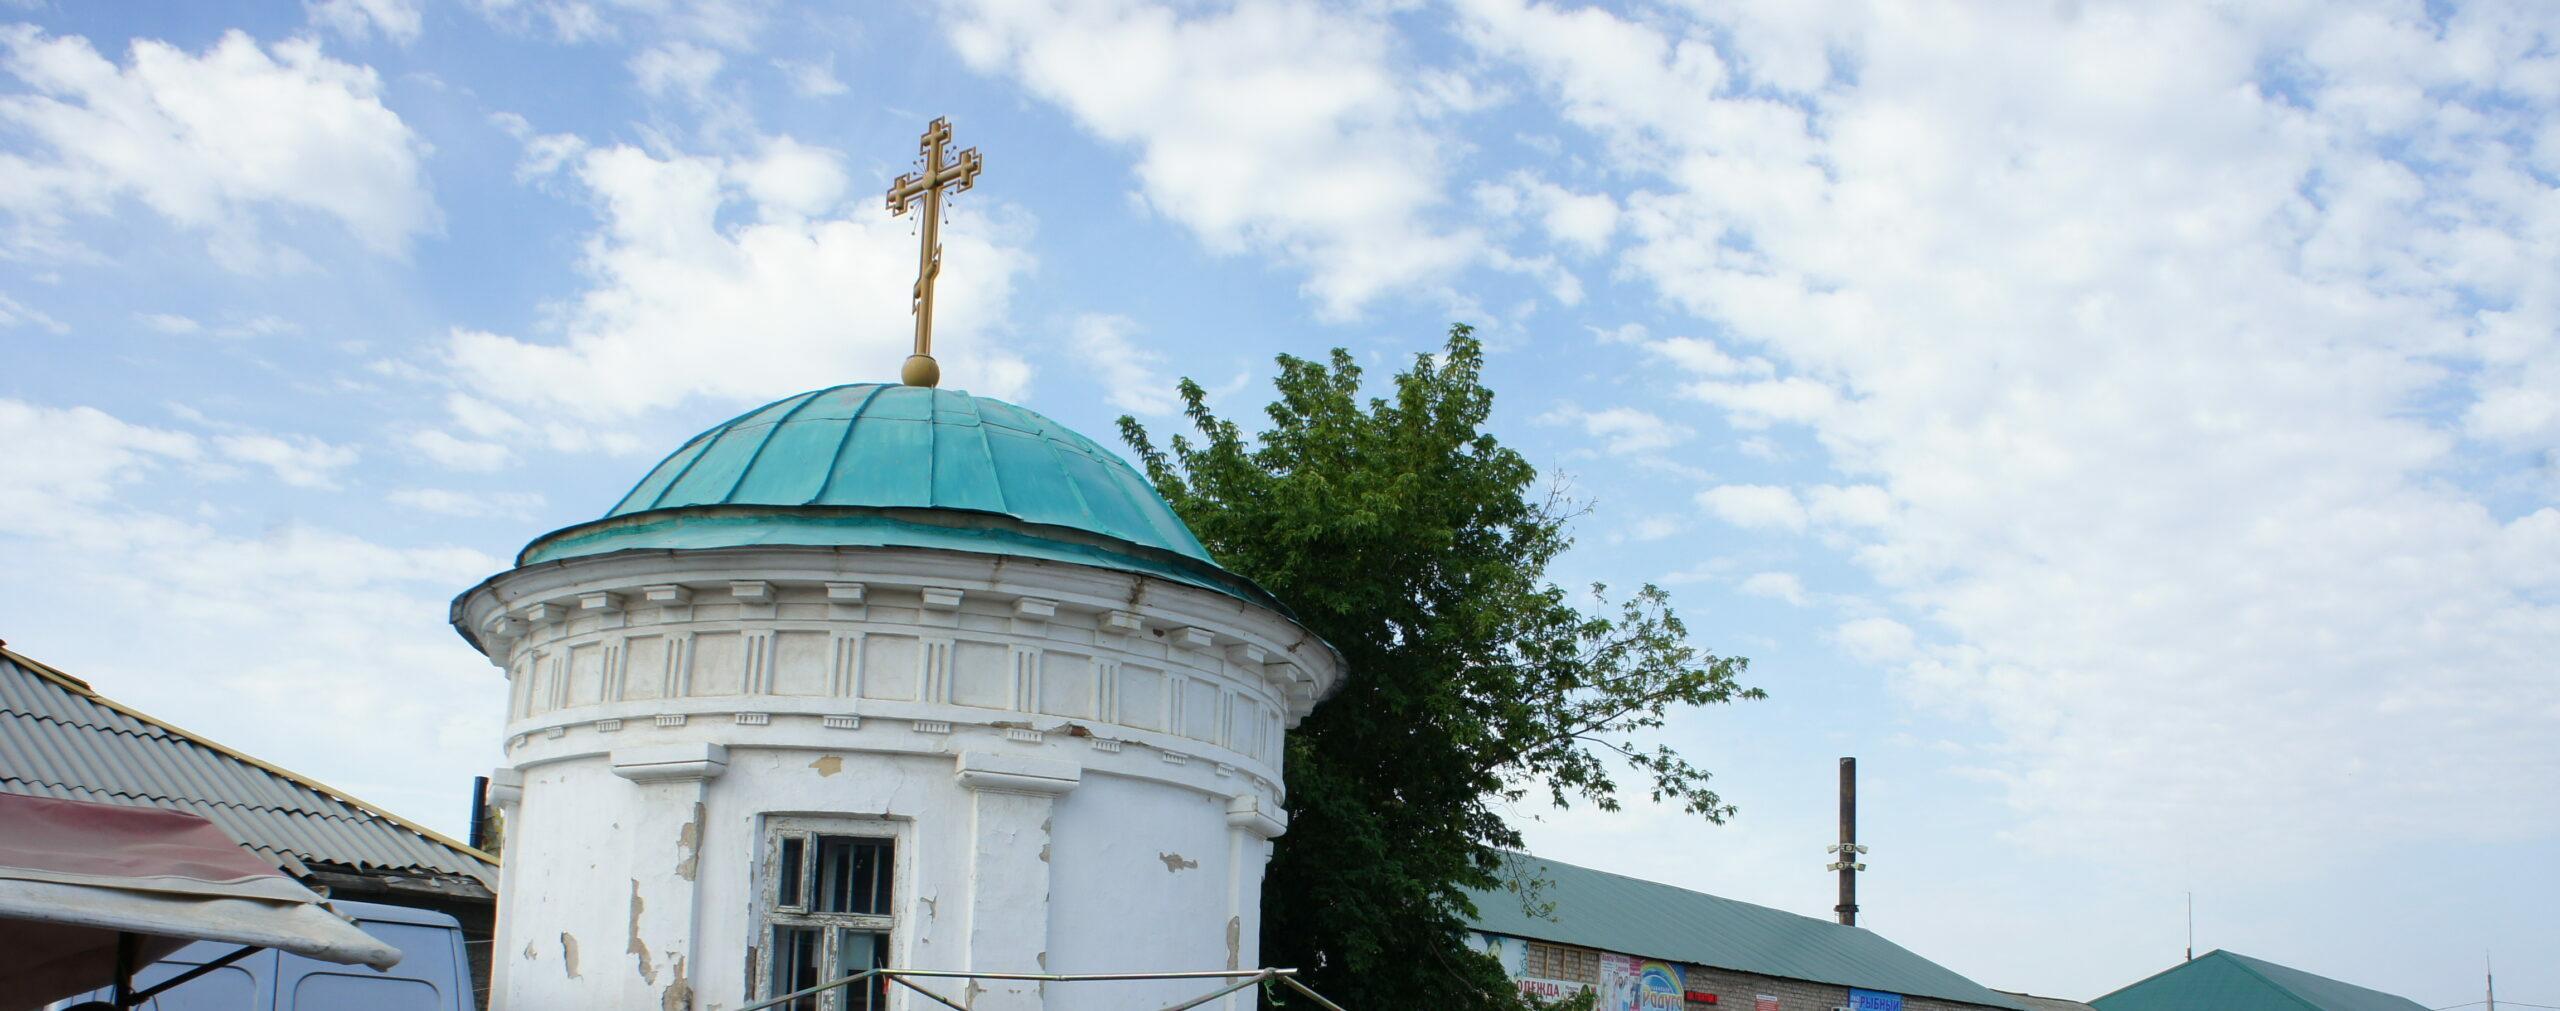 Храмы Соль-Илецка